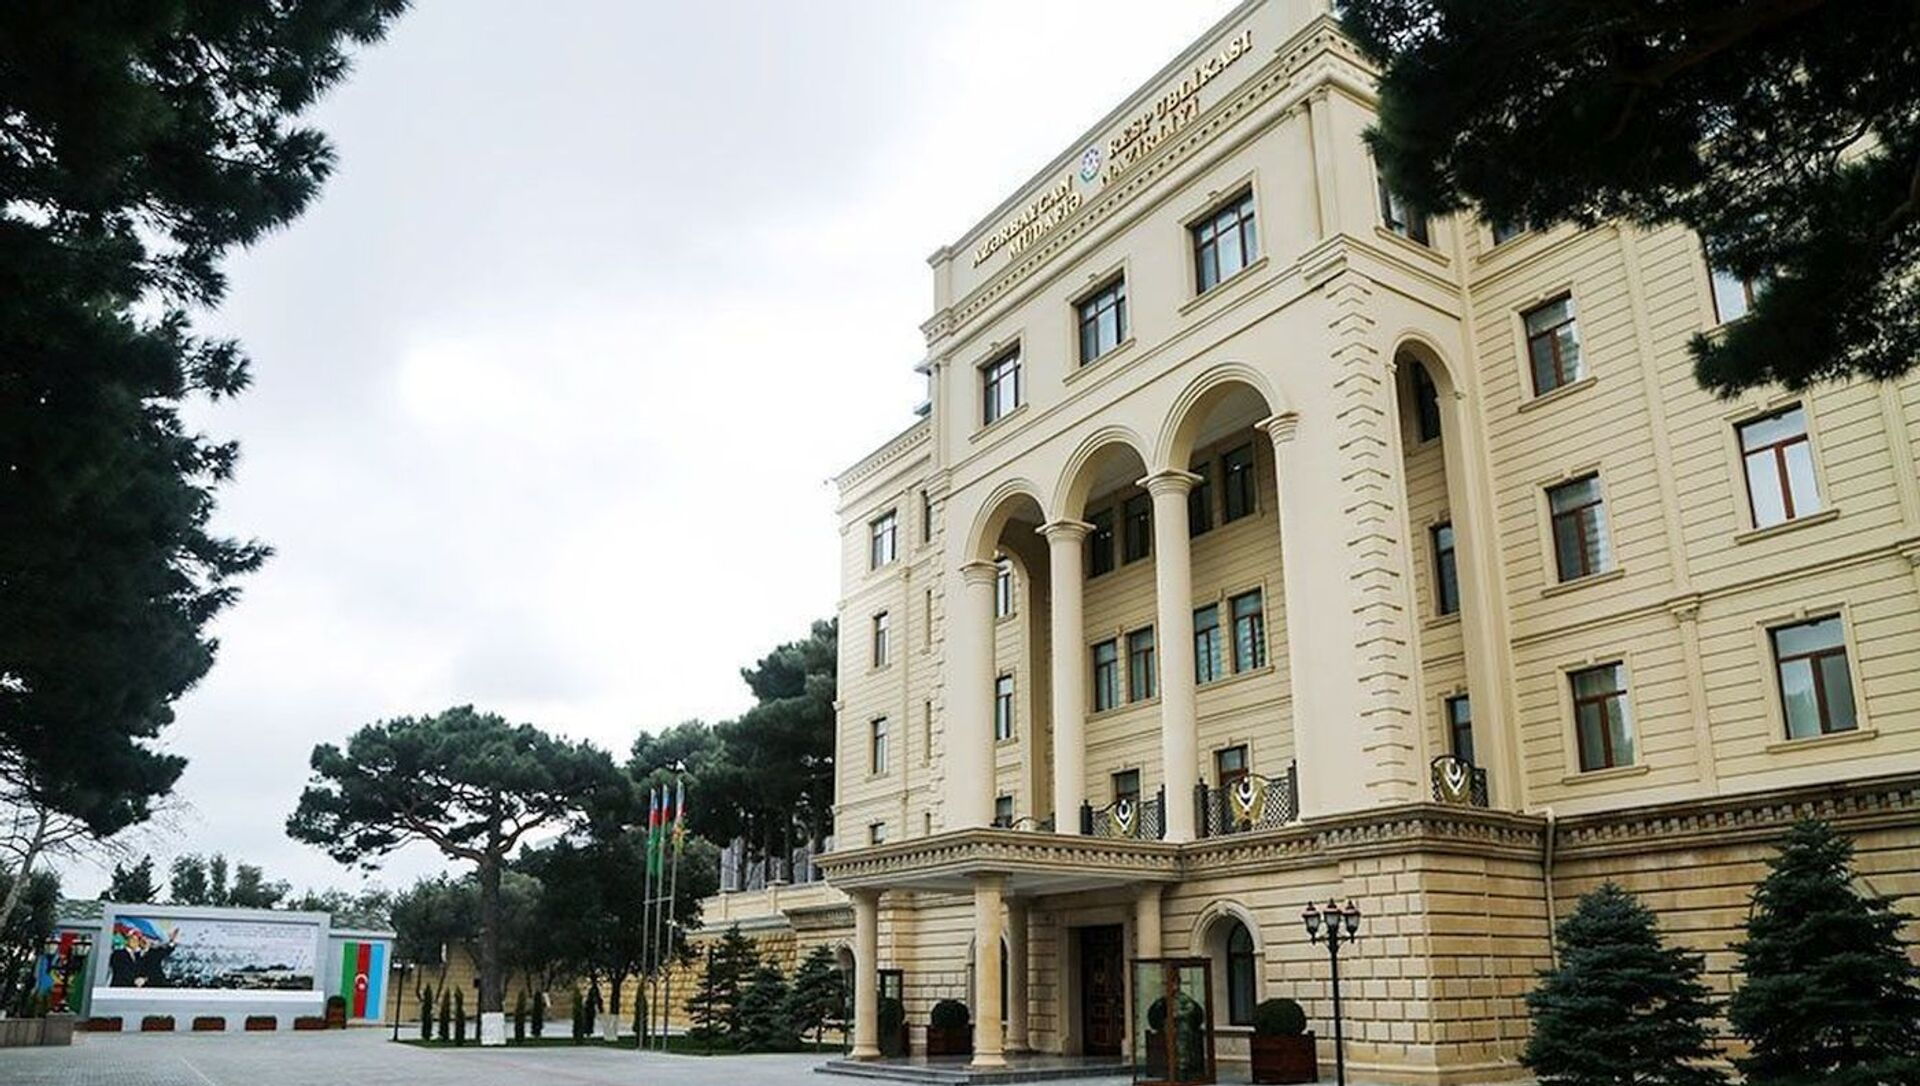 Здание Министерства Обороны Азербайджана - Sputnik Азербайджан, 1920, 09.08.2021